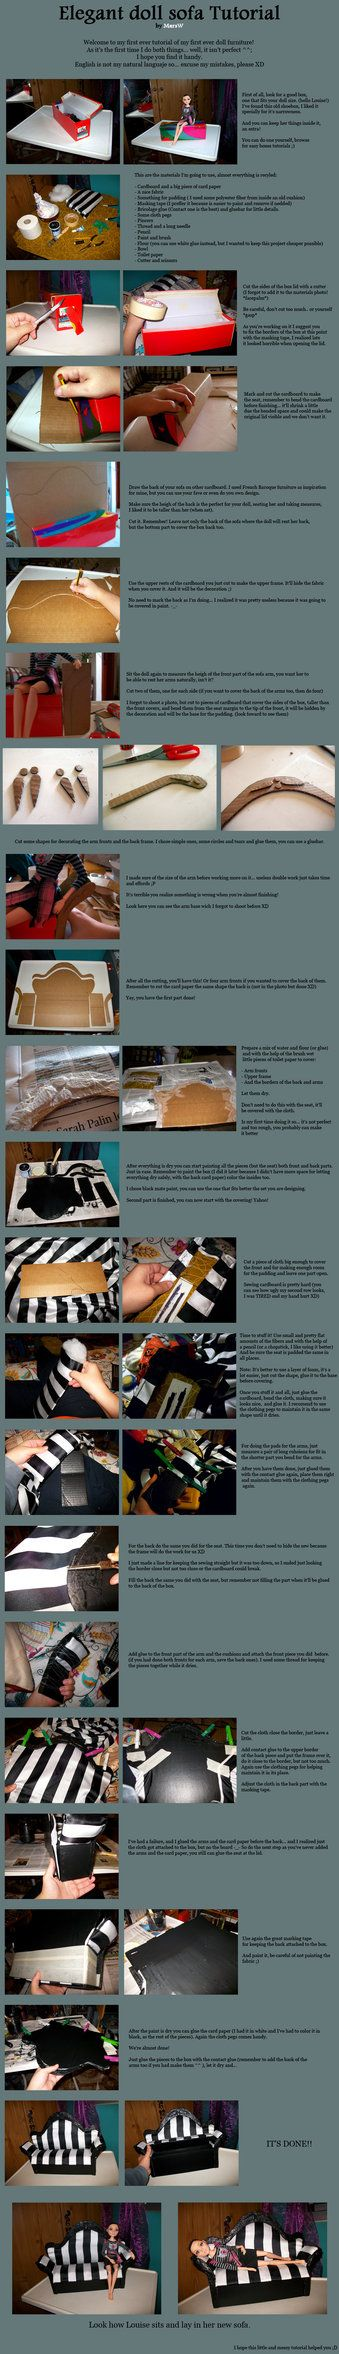 Elegant doll sofa tutorial by *MarsW on deviantART